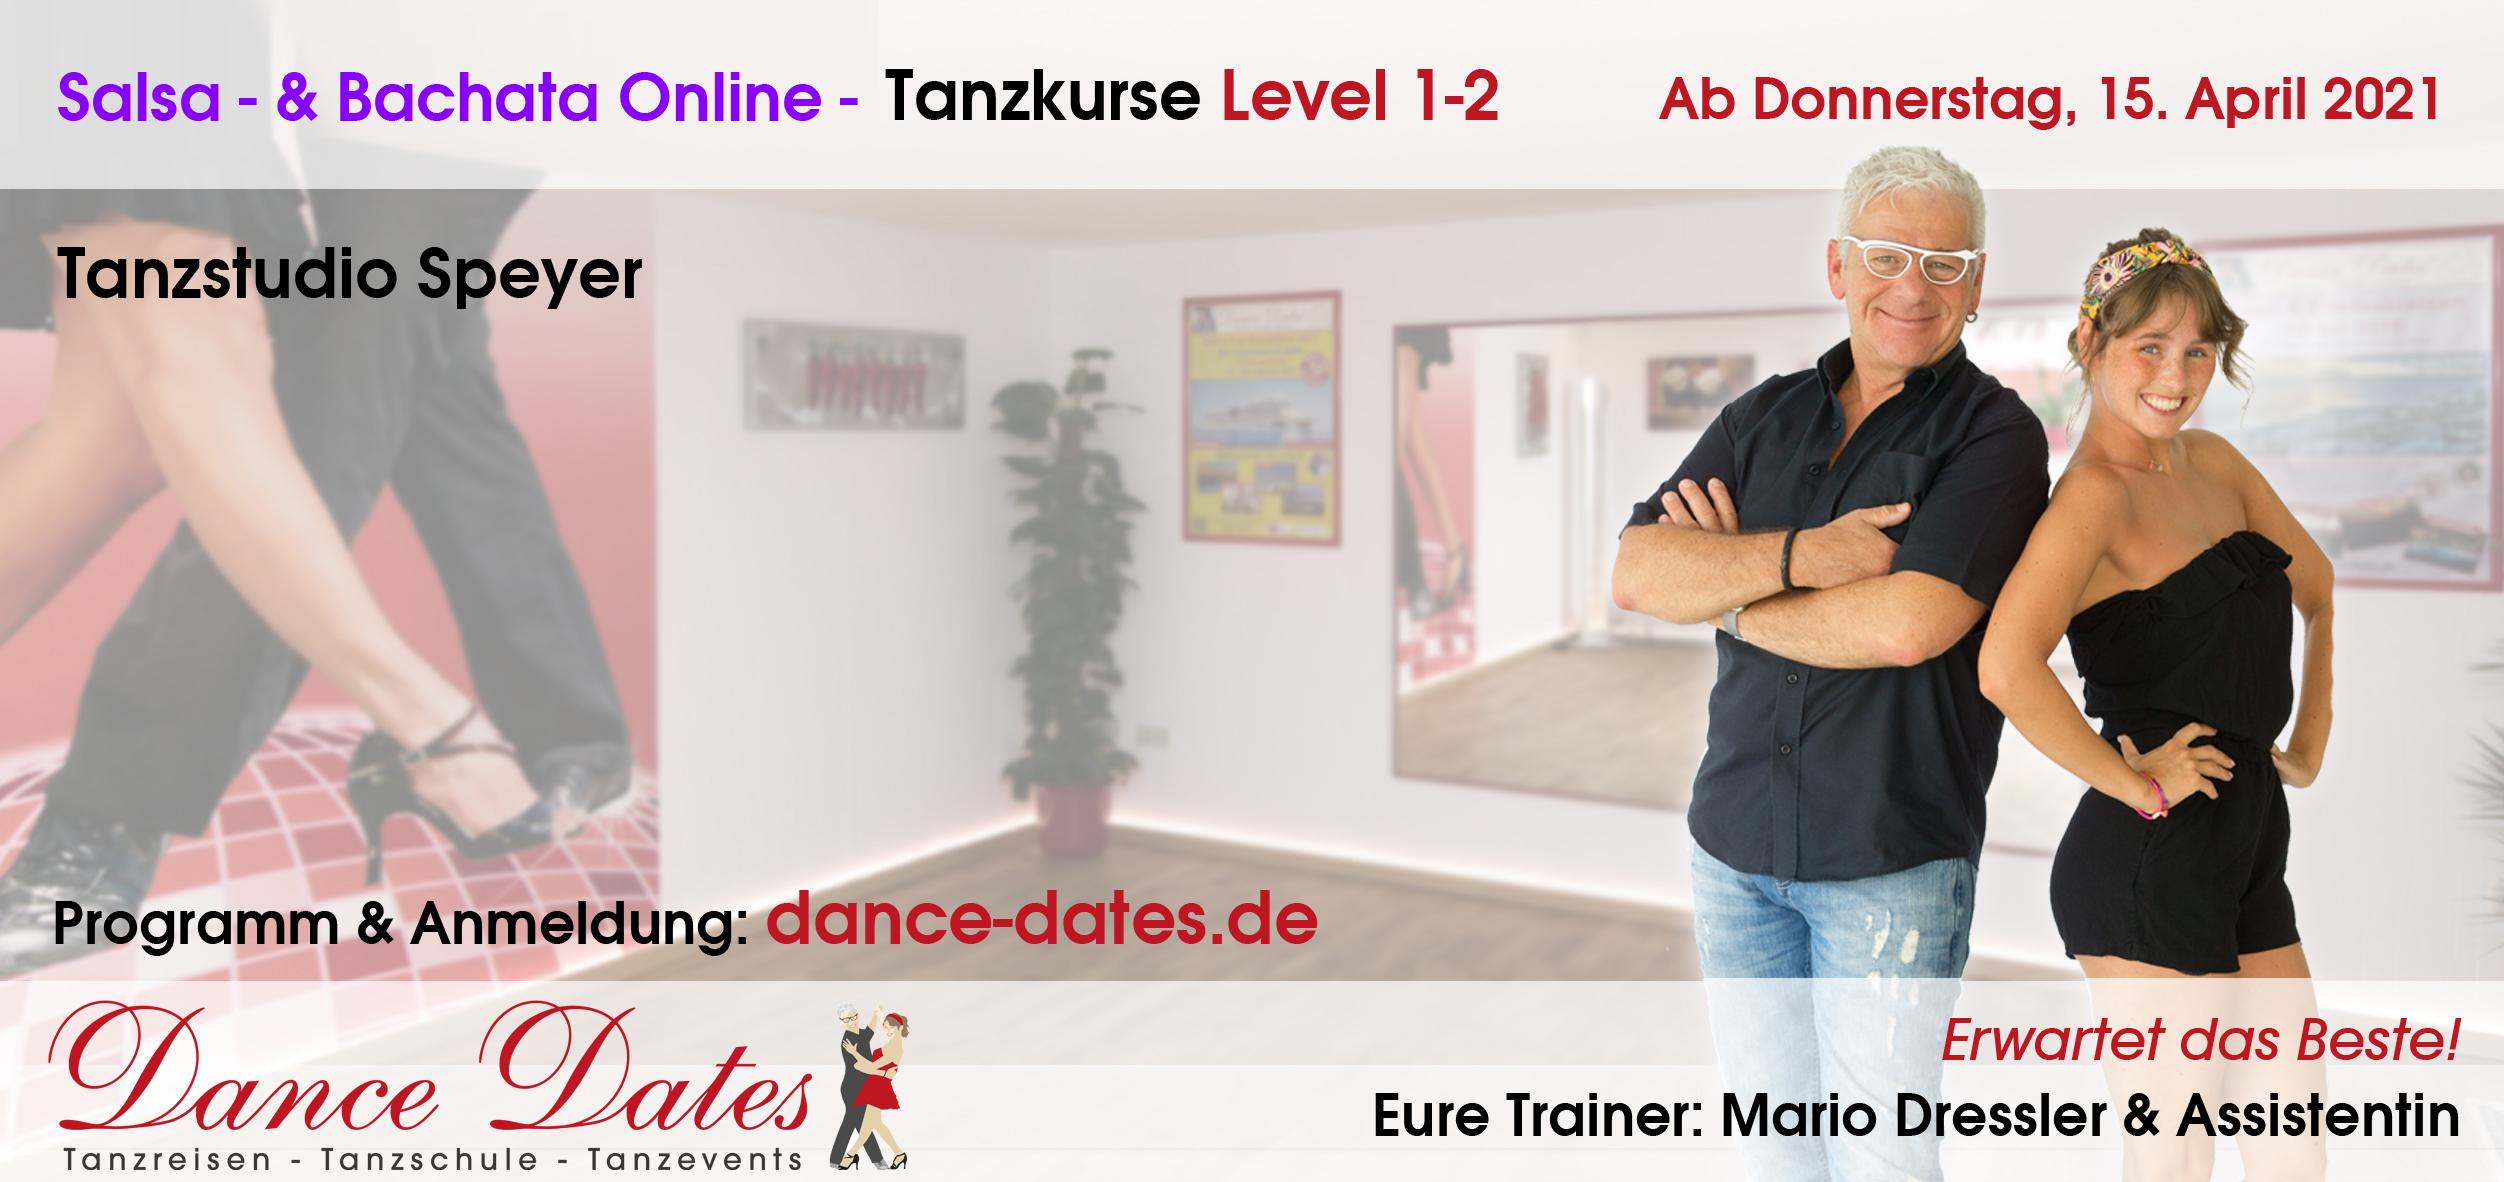 START: ONLINE-Salsa- & Bachata-Tanzkurse aus Speyer